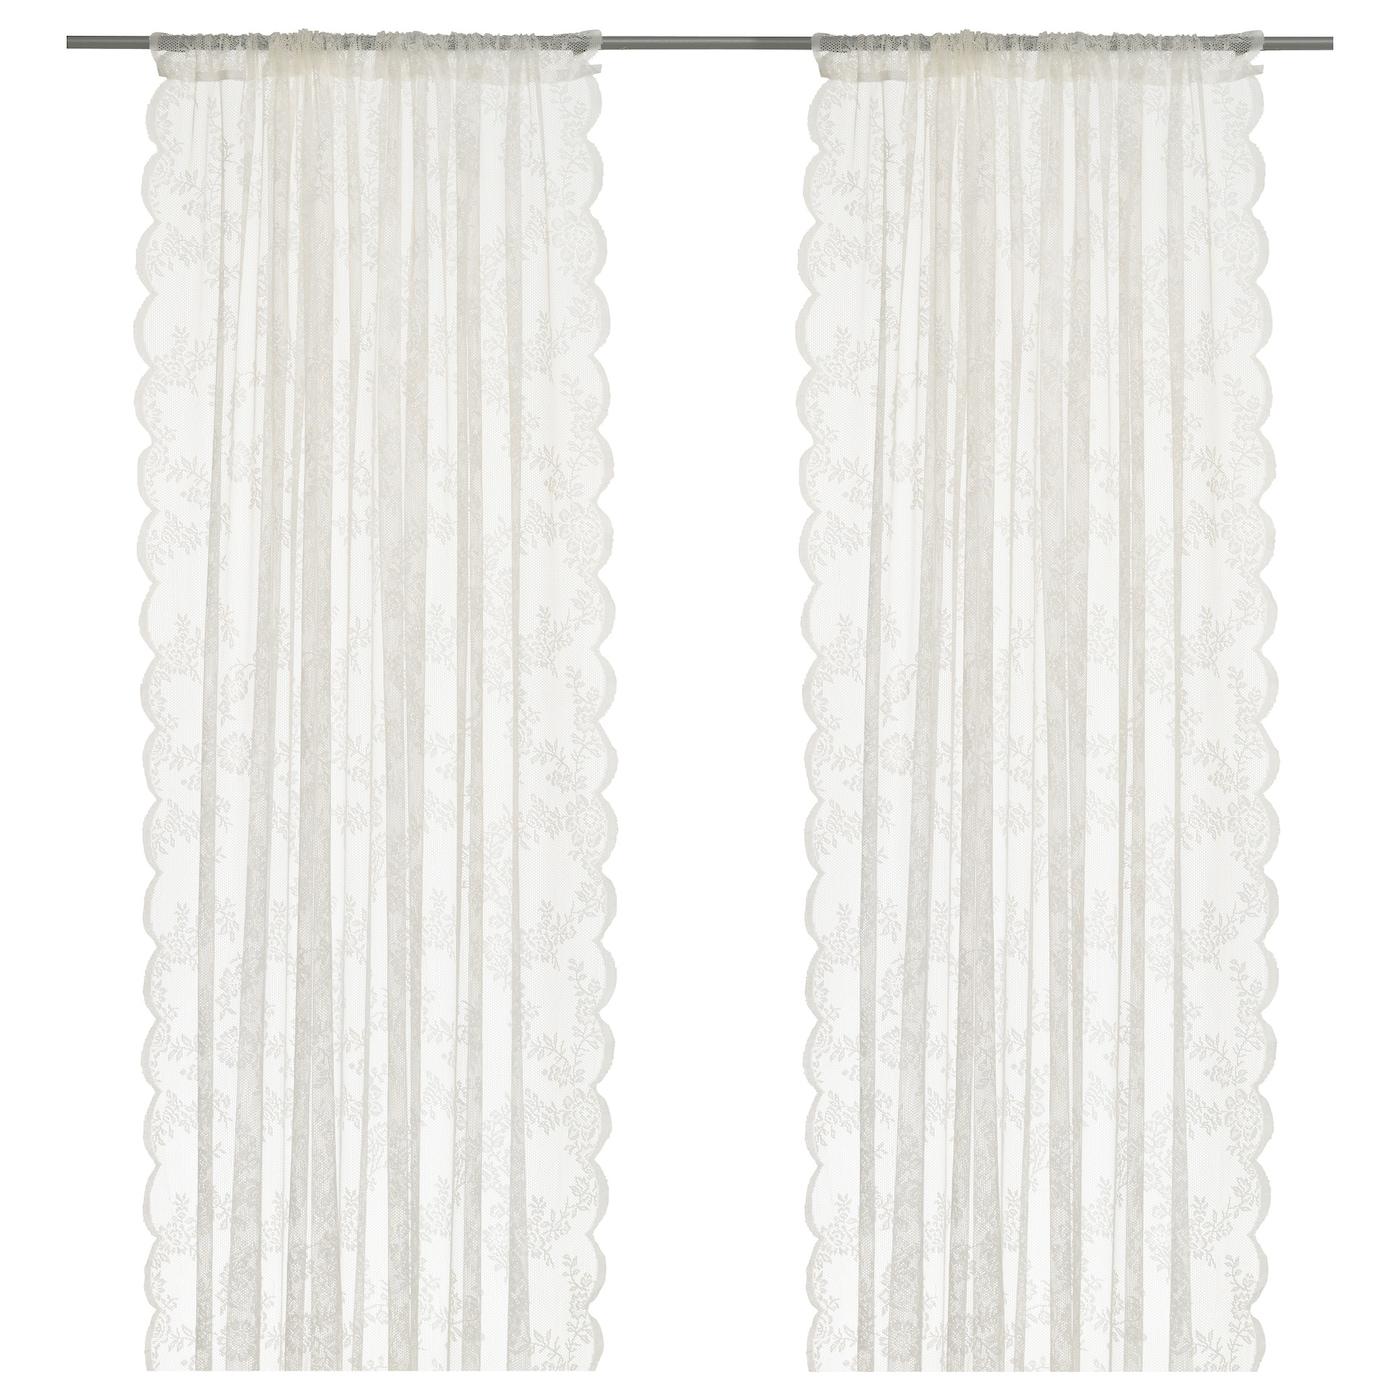 ALVINE SPETS Net curtains 1 pair f white 145x250 cm IKEA